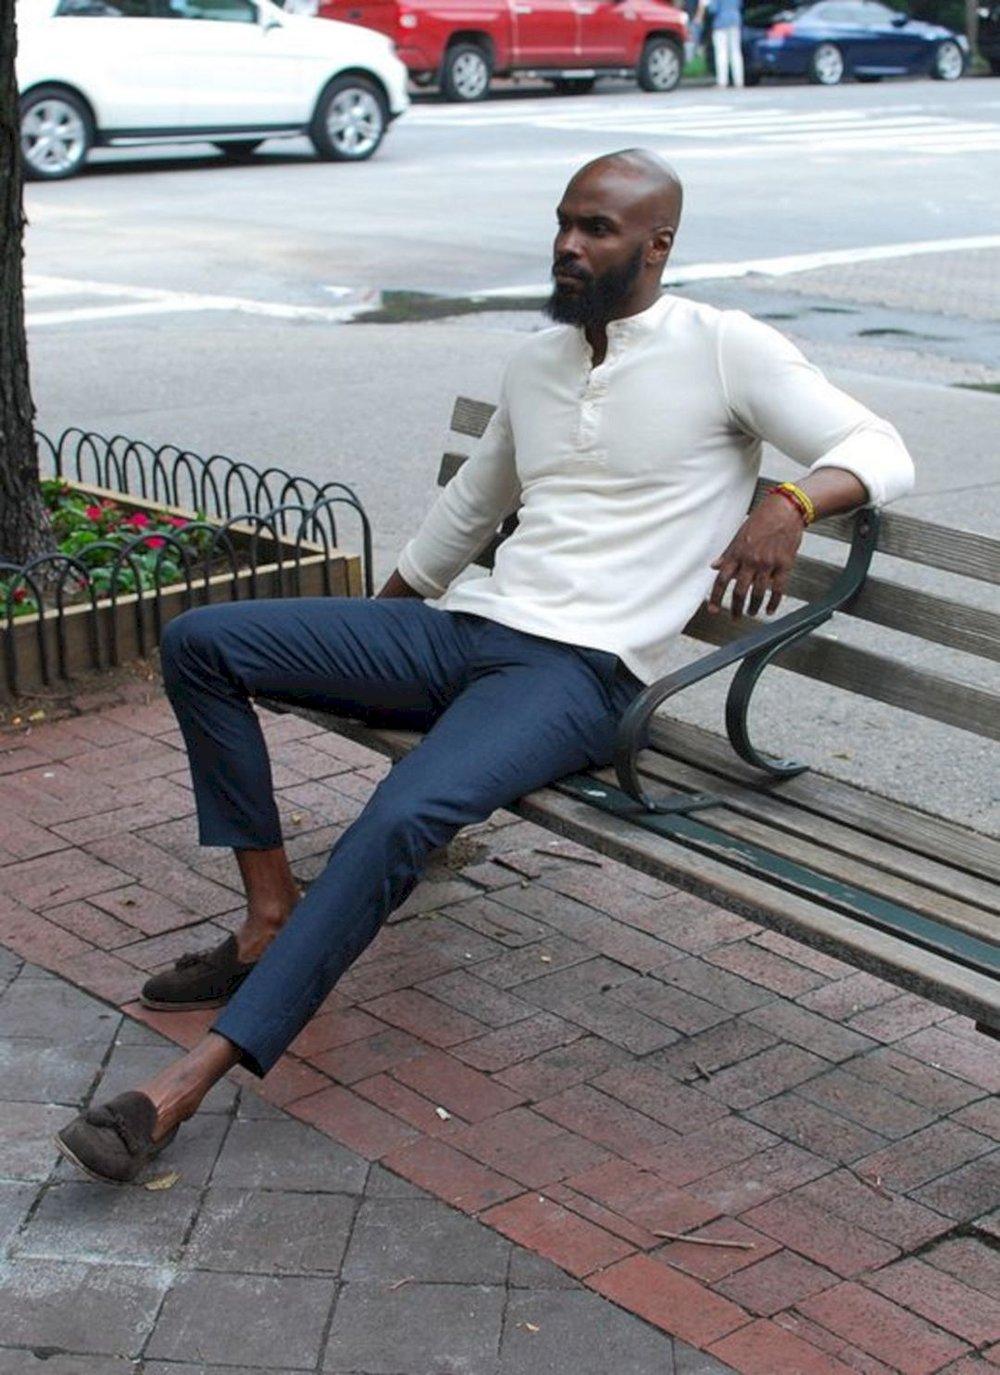 Awesome-Henley-Shirt-For-Mens-Ideas-6.jpg e1314b771ceb8